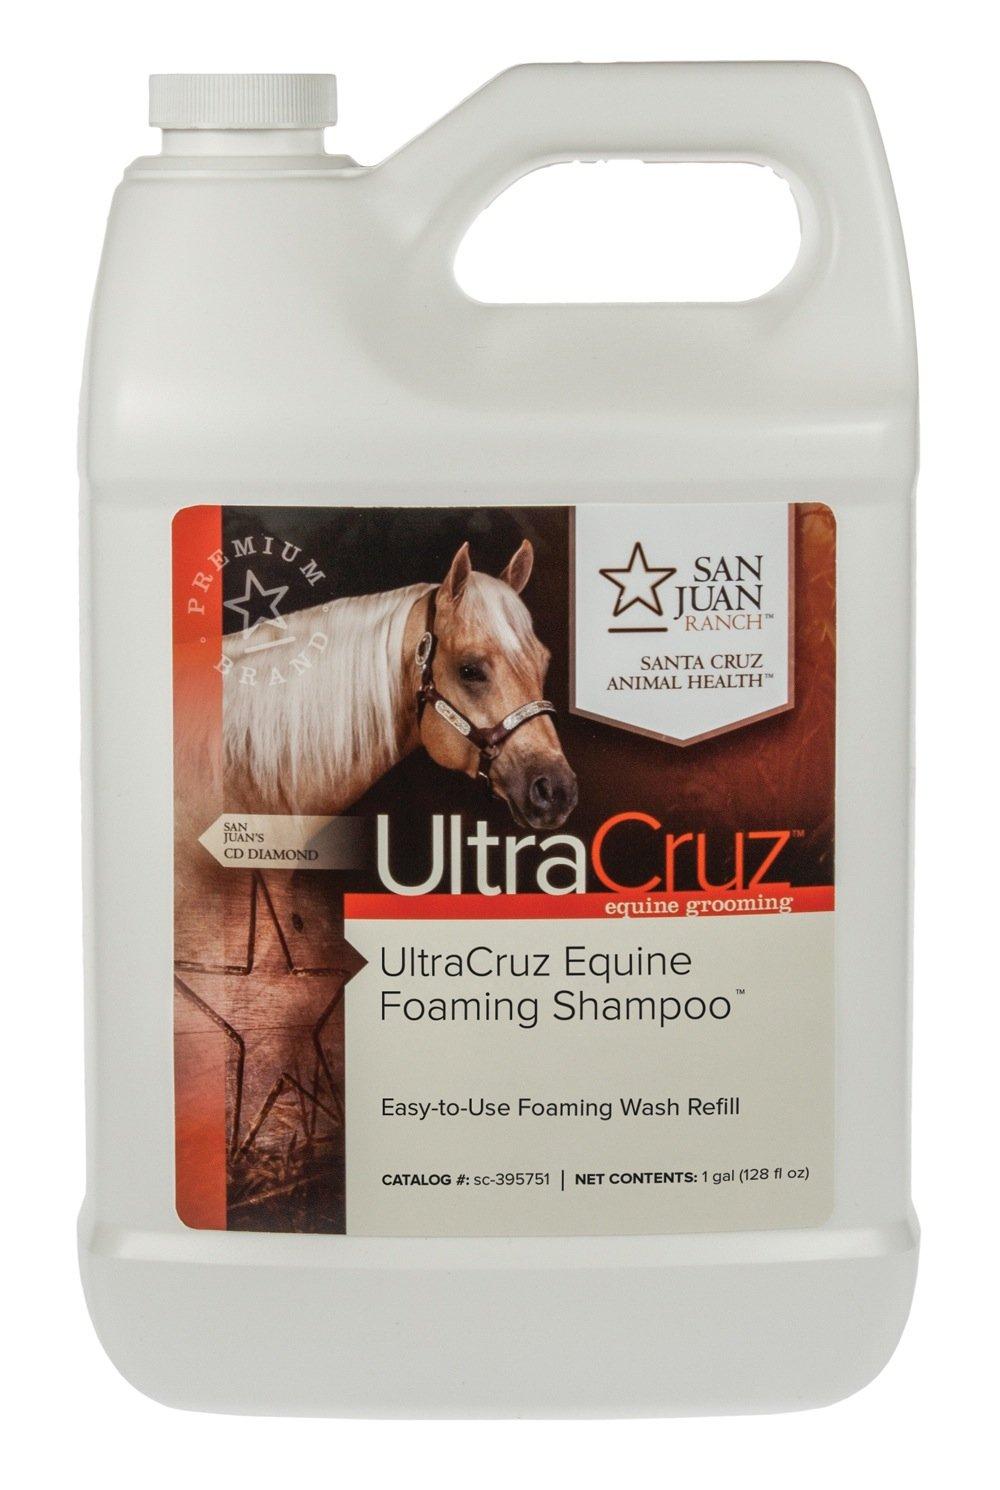 UltraCruz Equine Foaming Horse Shampoo, 1 Gallon Refill by UltraCruz